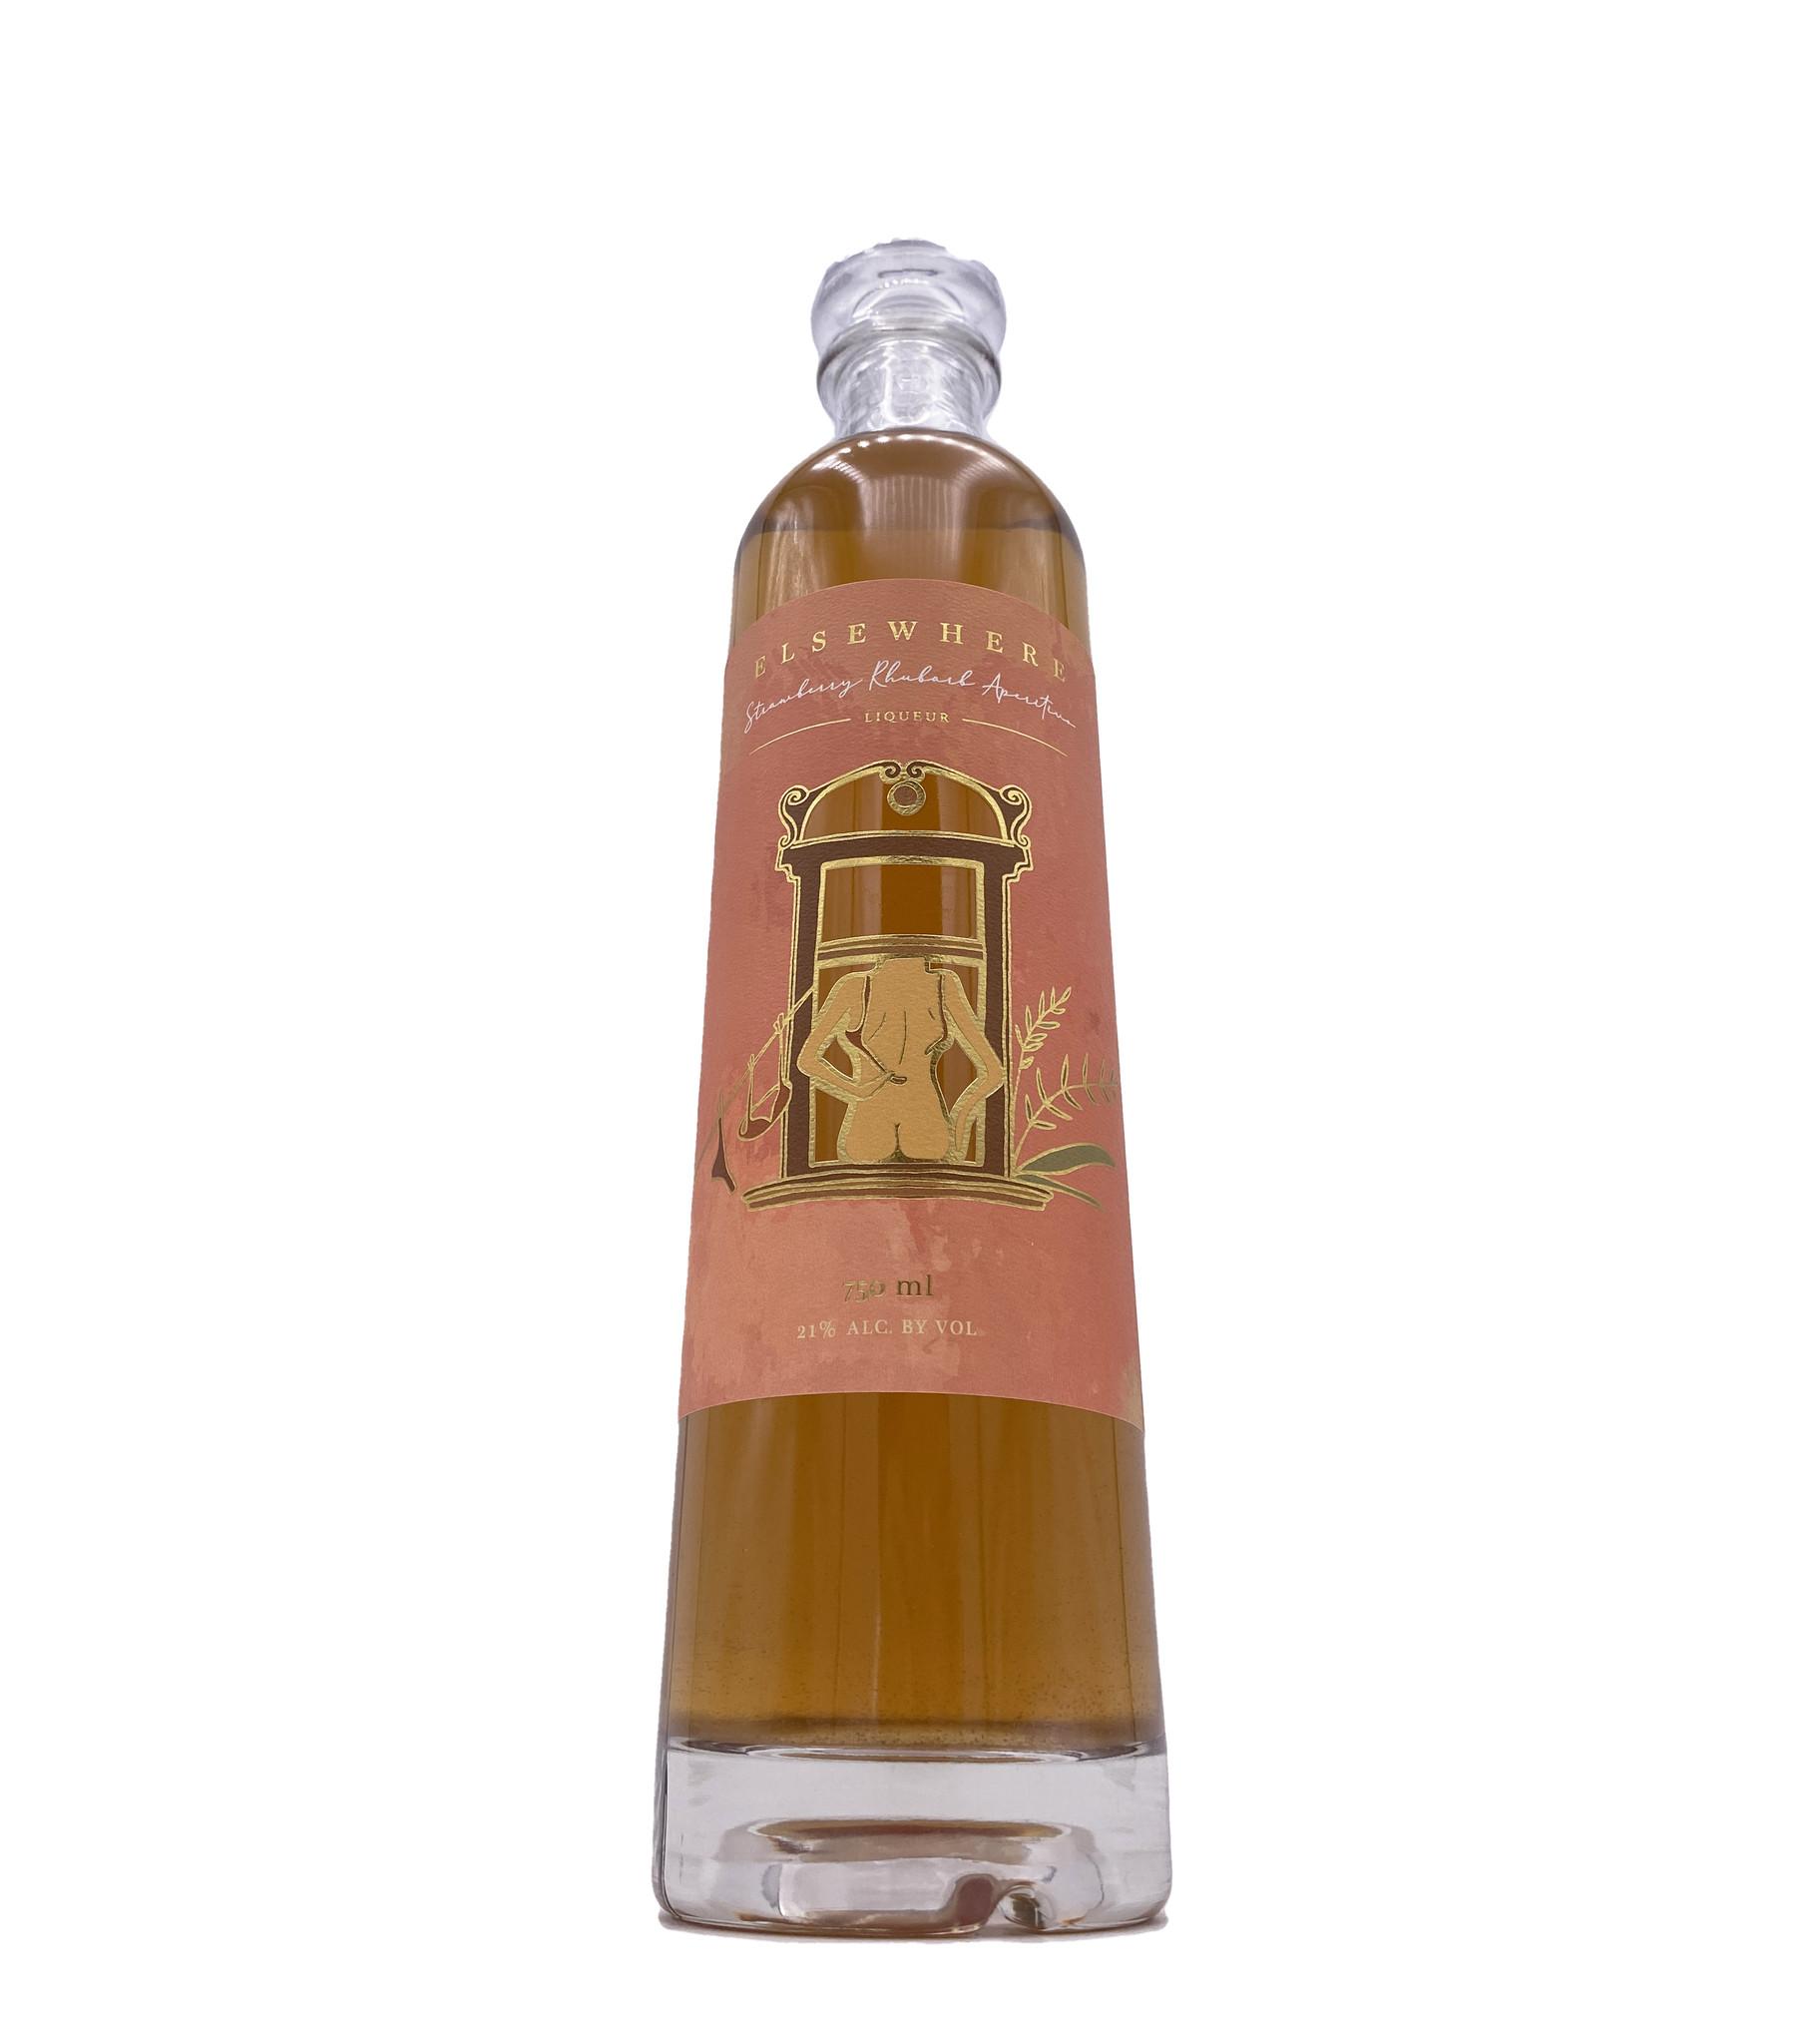 Elsewhere Strawberry Rhubarb Aperitivo, Matchbook Distilling